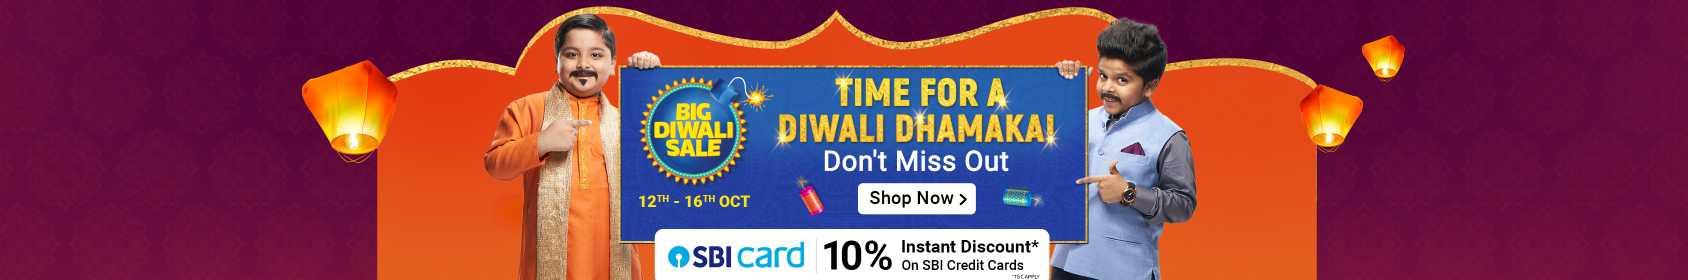 Flipkart-Big-Diwali-Sale-2019